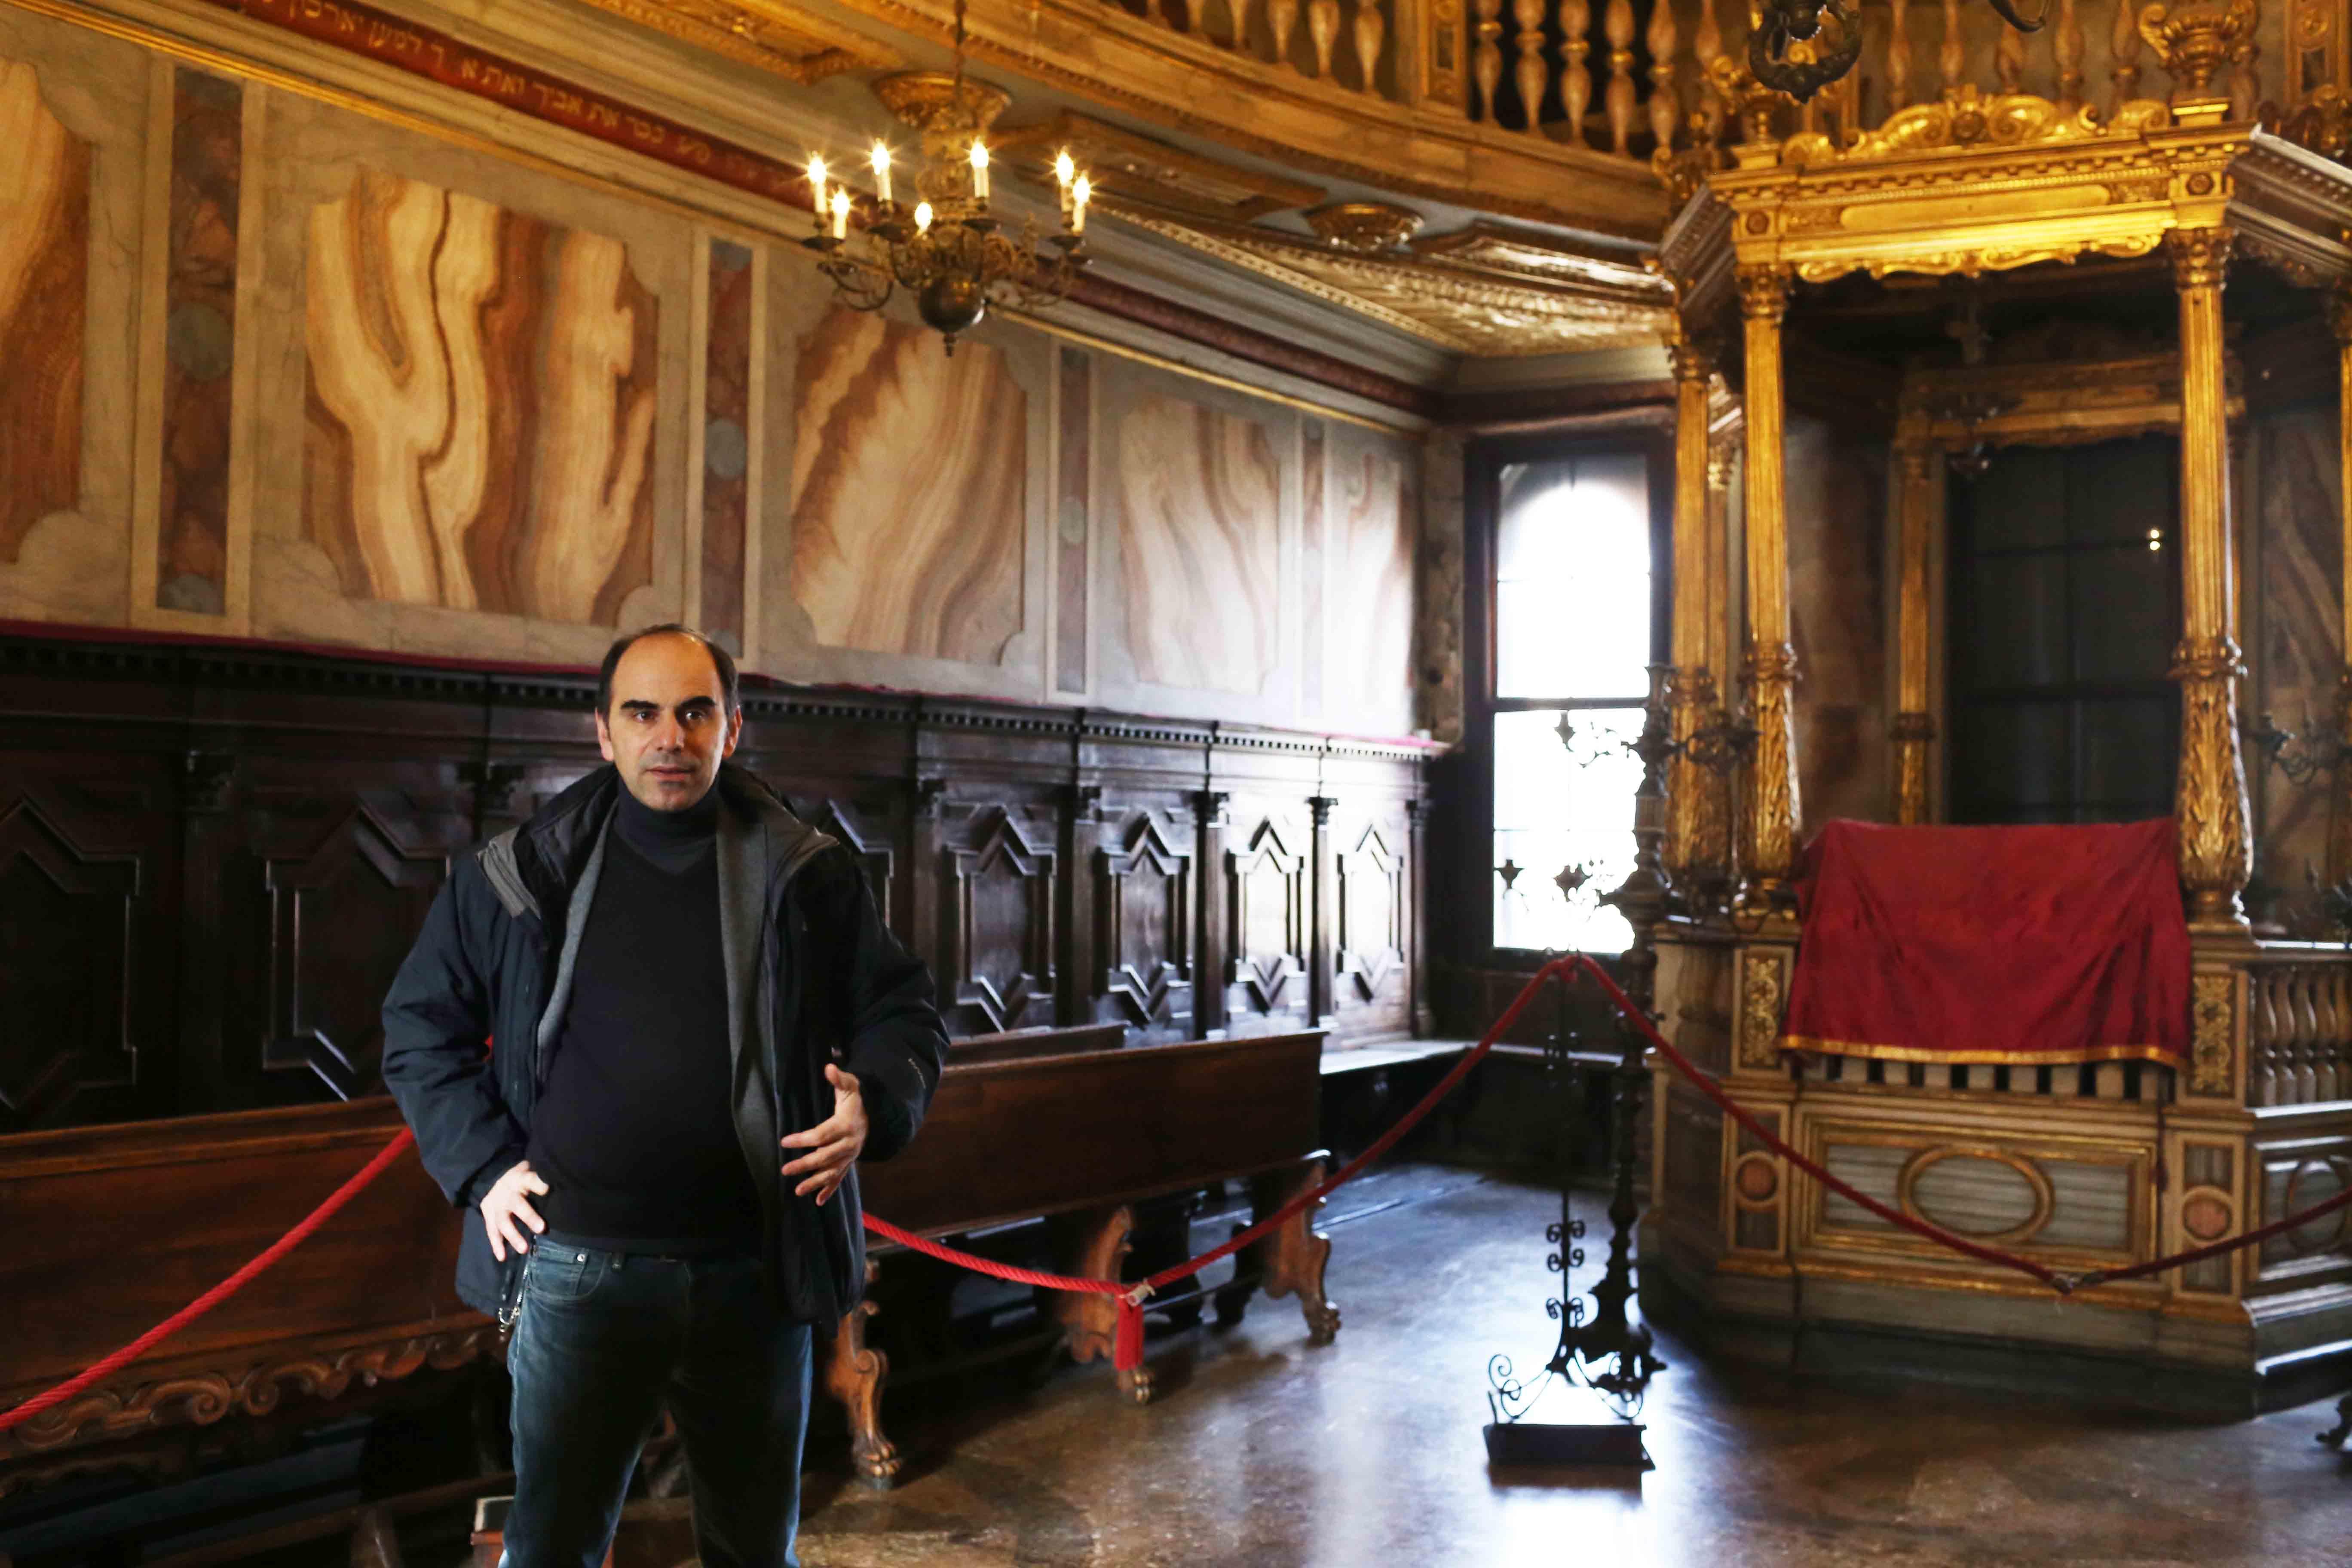 City Faith - Shylock's Synagogue, Venice Ghetto